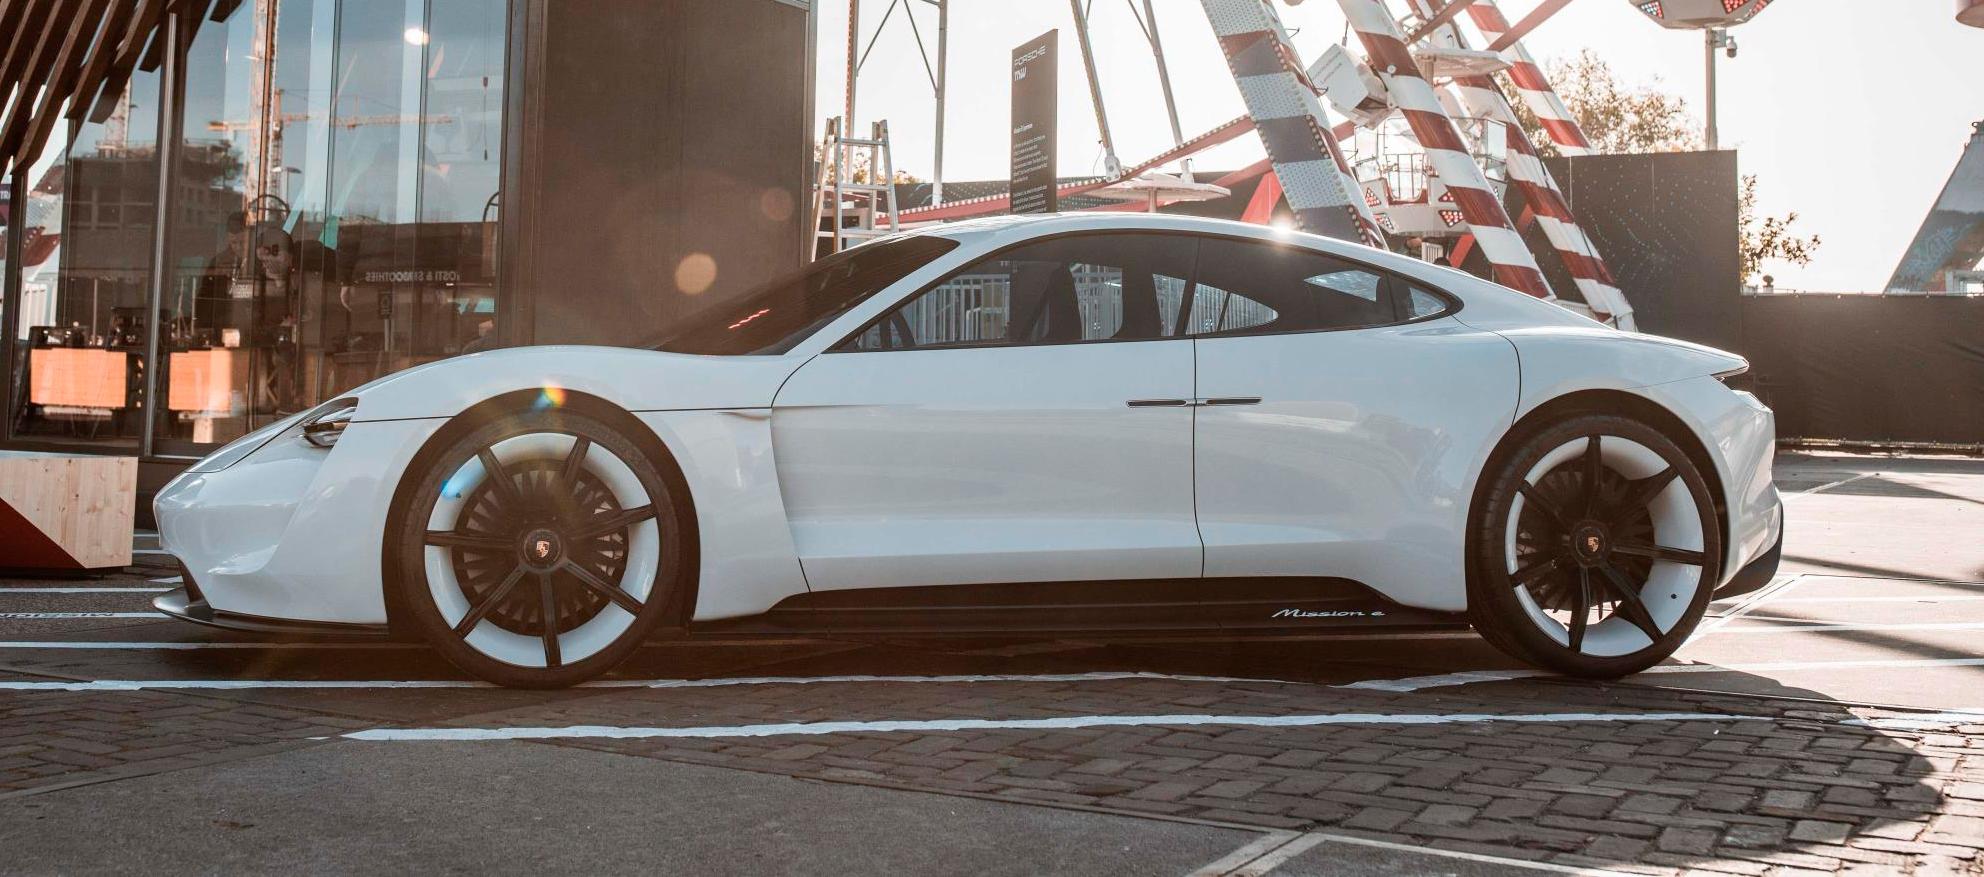 Porsche Taycan, el primer Porsche 100% eléctrico